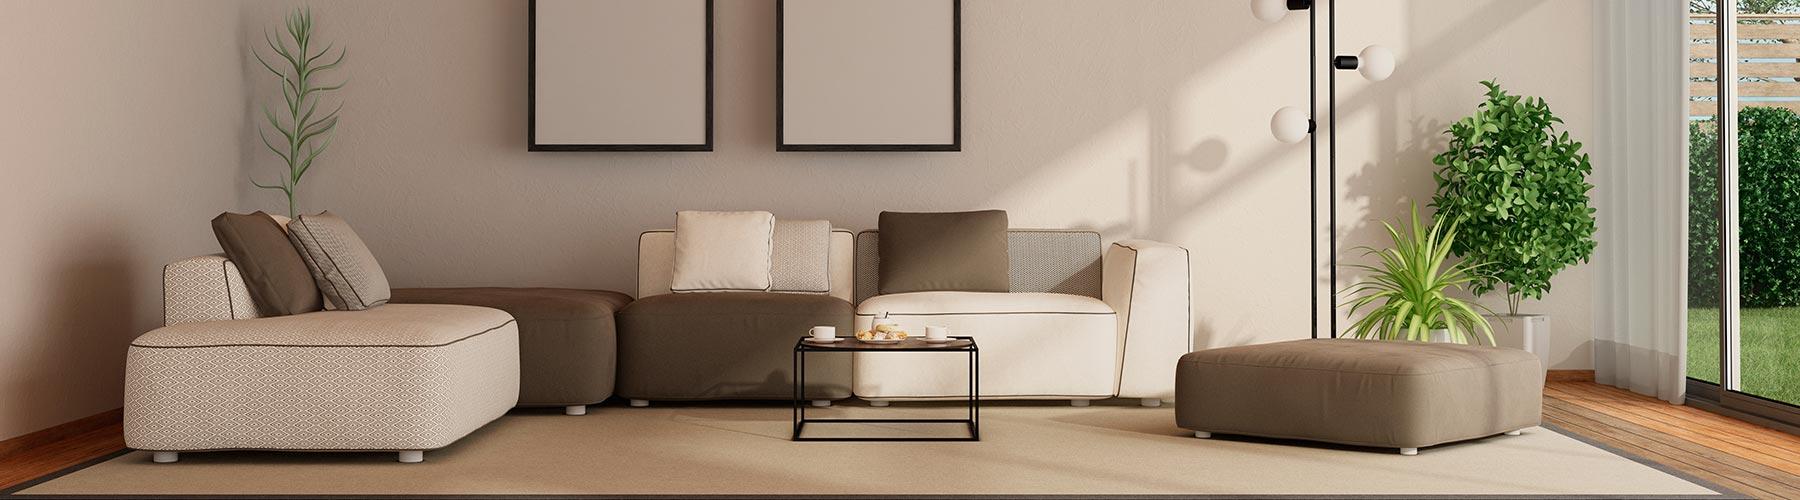 Living Room - Property For Sale Moraira